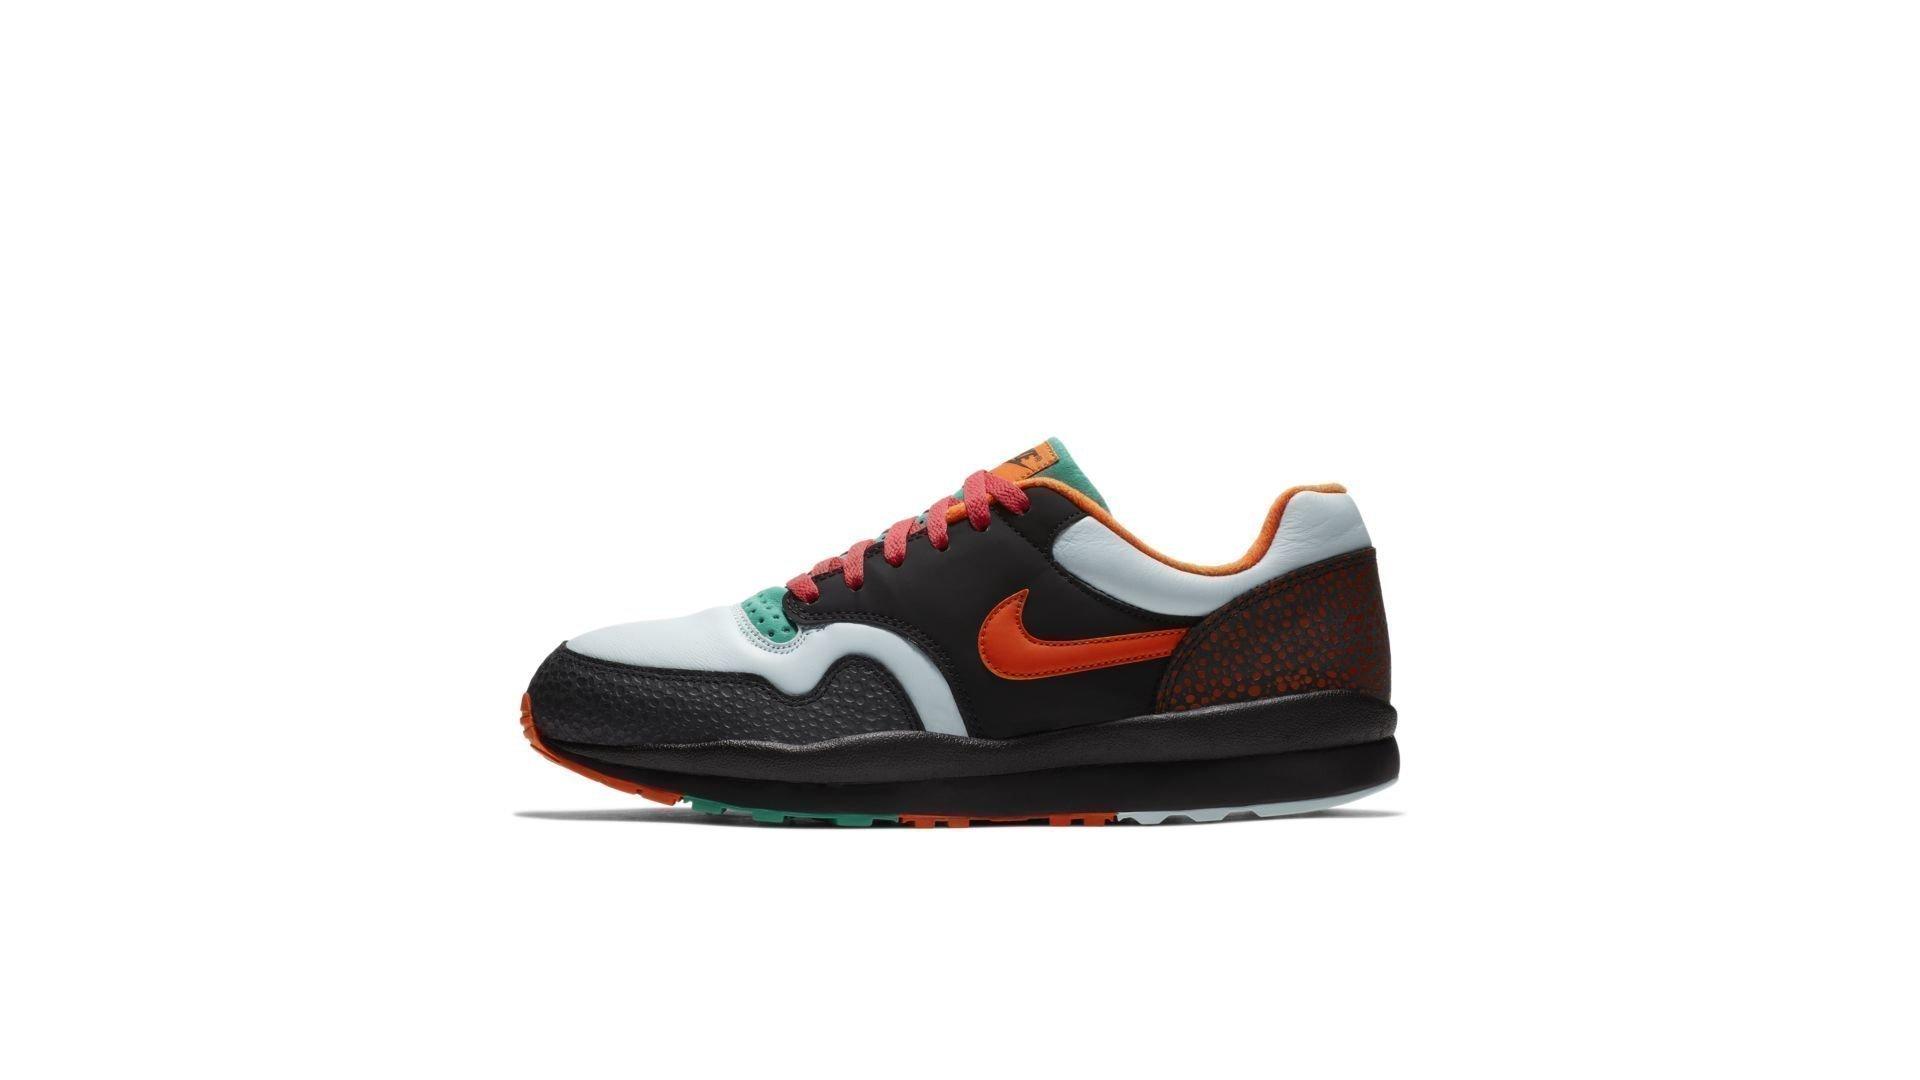 Nike Air Safari 'Tech Pack' Kabutomushi (AO3298-002)